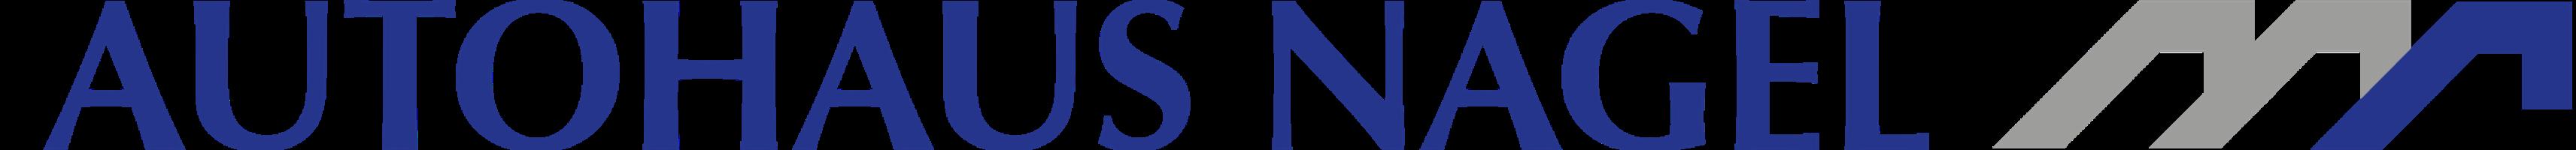 Autohaus Nagel